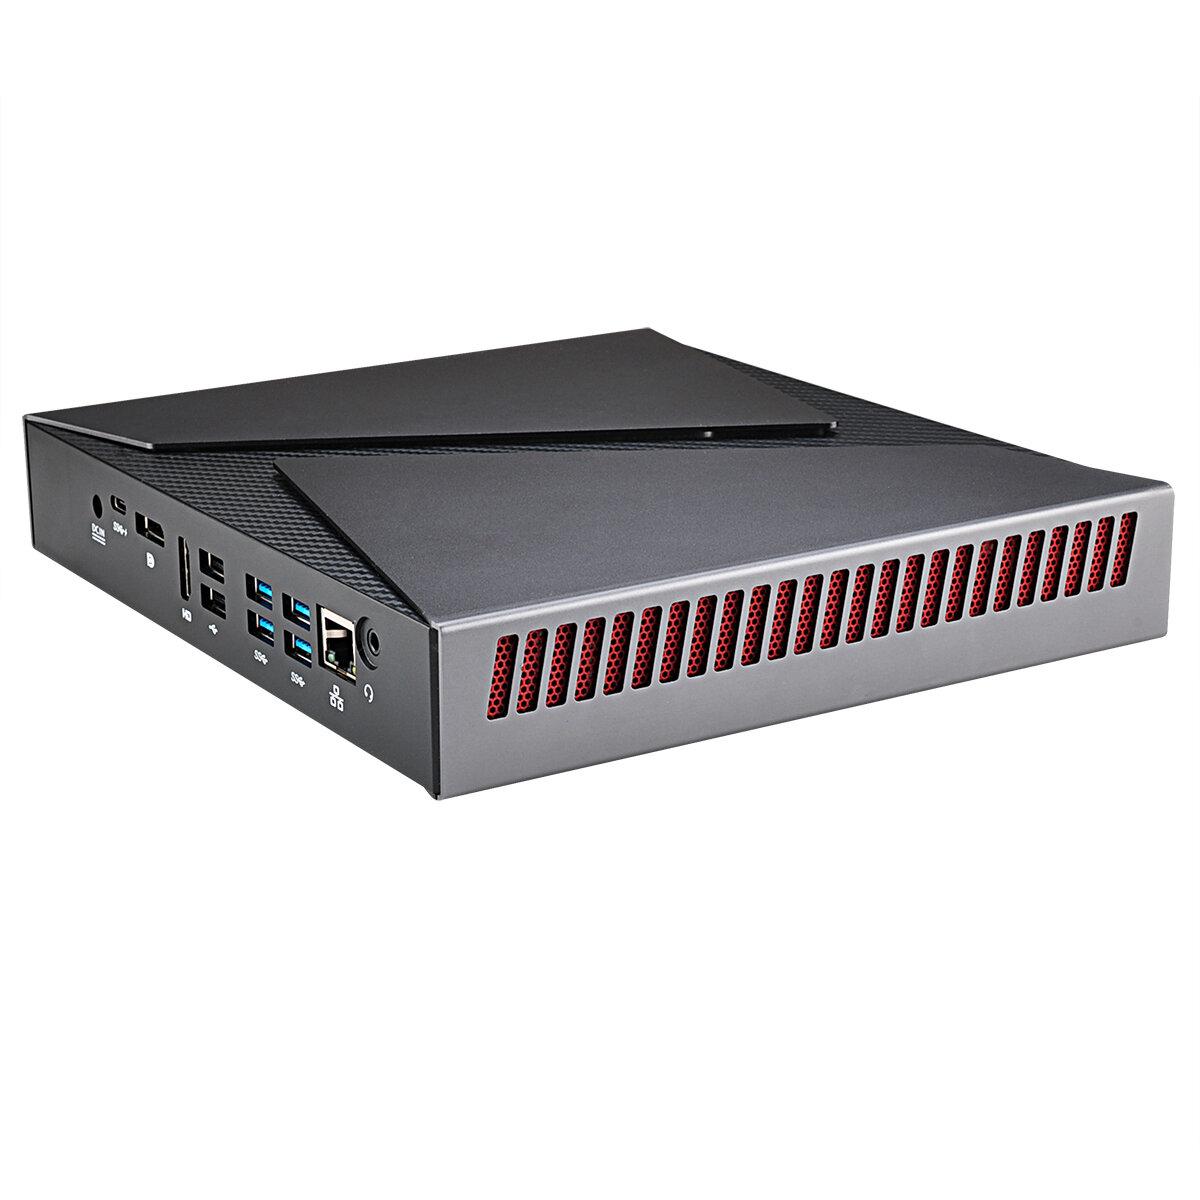 Mini PC i9-8950H GTX 1650 16GB + 512 SSD 6 Core 2.9GHz a 4.8GHz DDR4 * 2 Ranuras M.2 2280